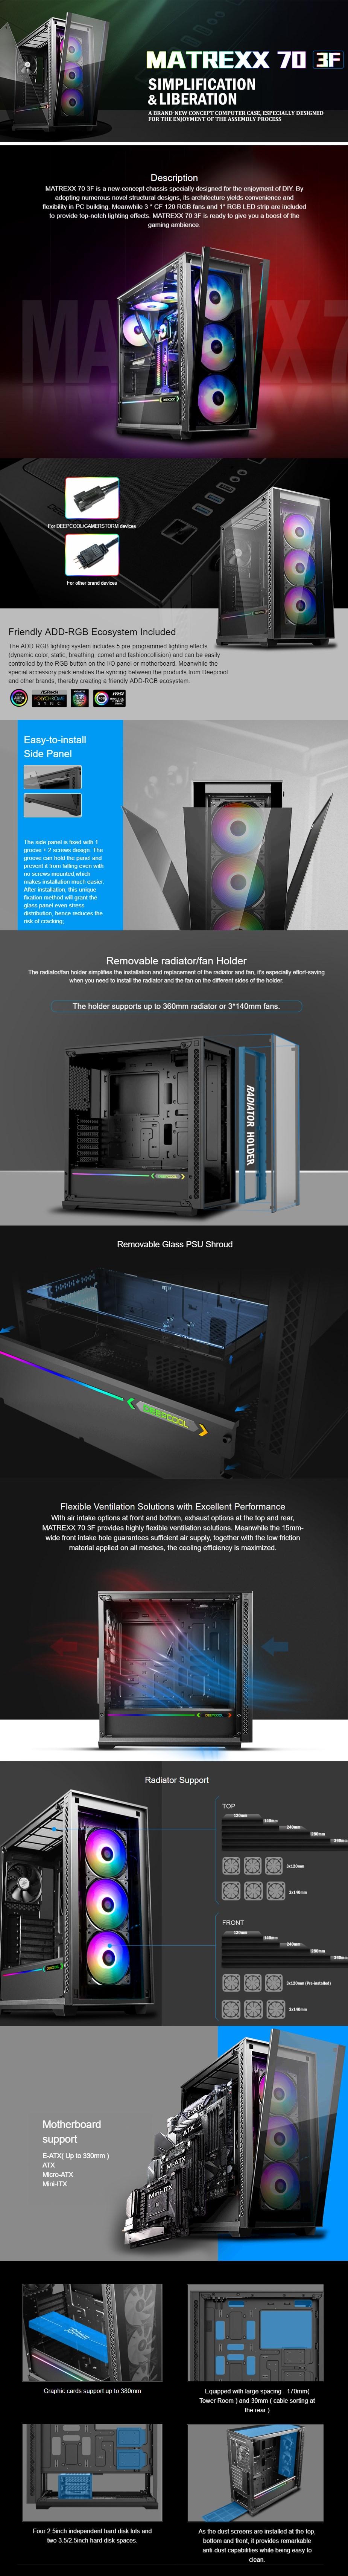 Deepcool Matrexx 70 3F Tempered Glass RGB Mid-Tower E-ATX Case - Desktop Overview 1